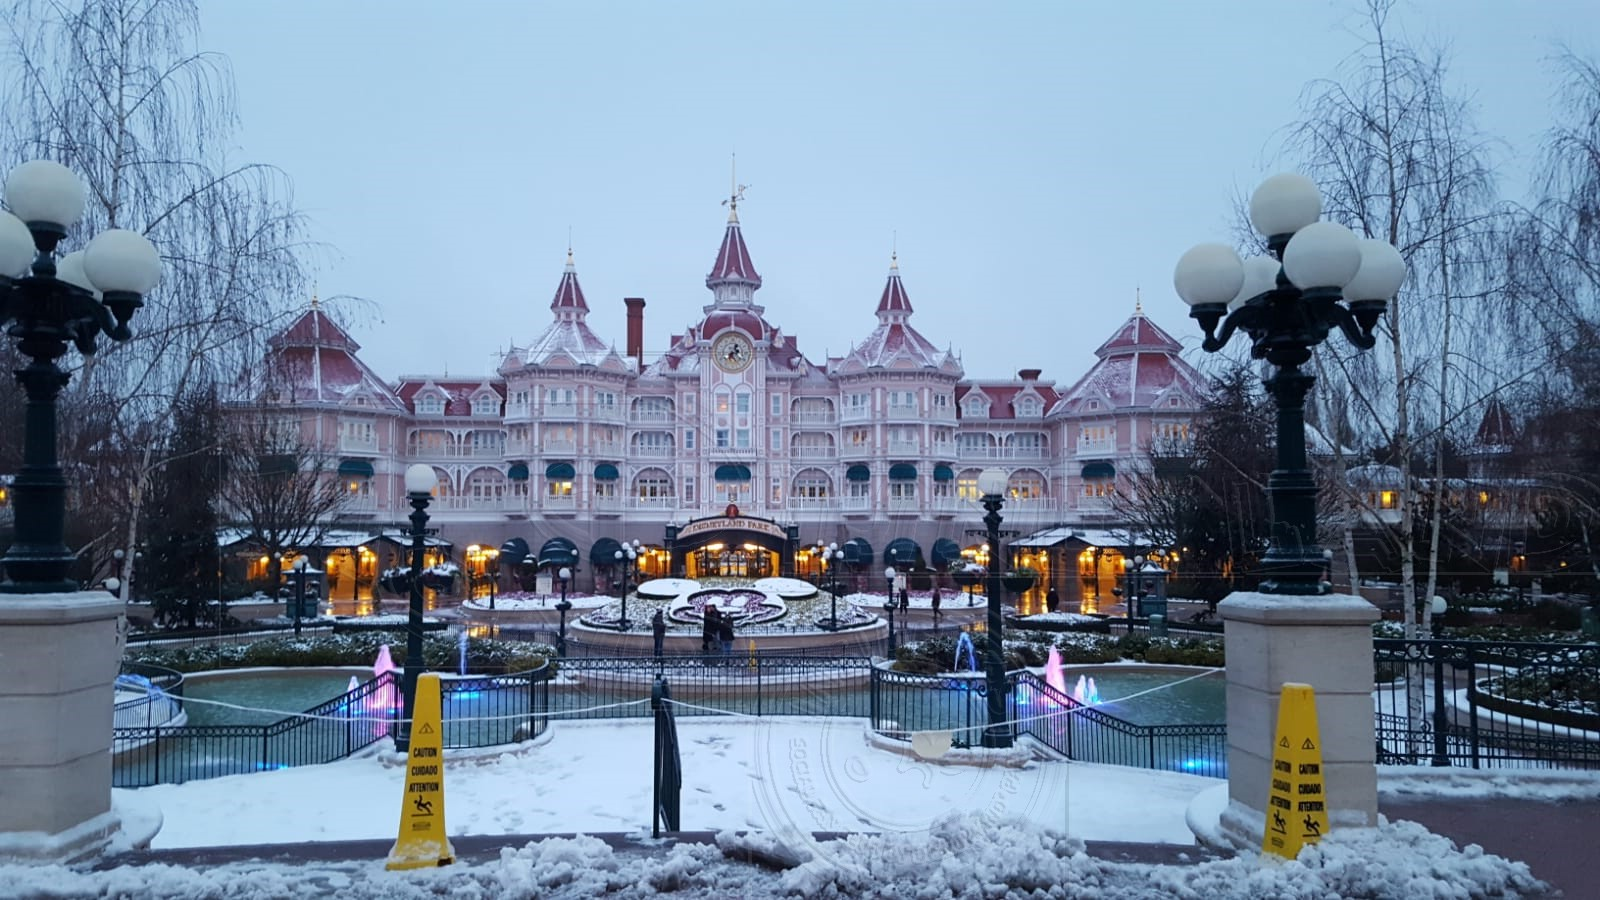 2018 - Disneyland Paris sotto la neve - Pagina 4 01neve27